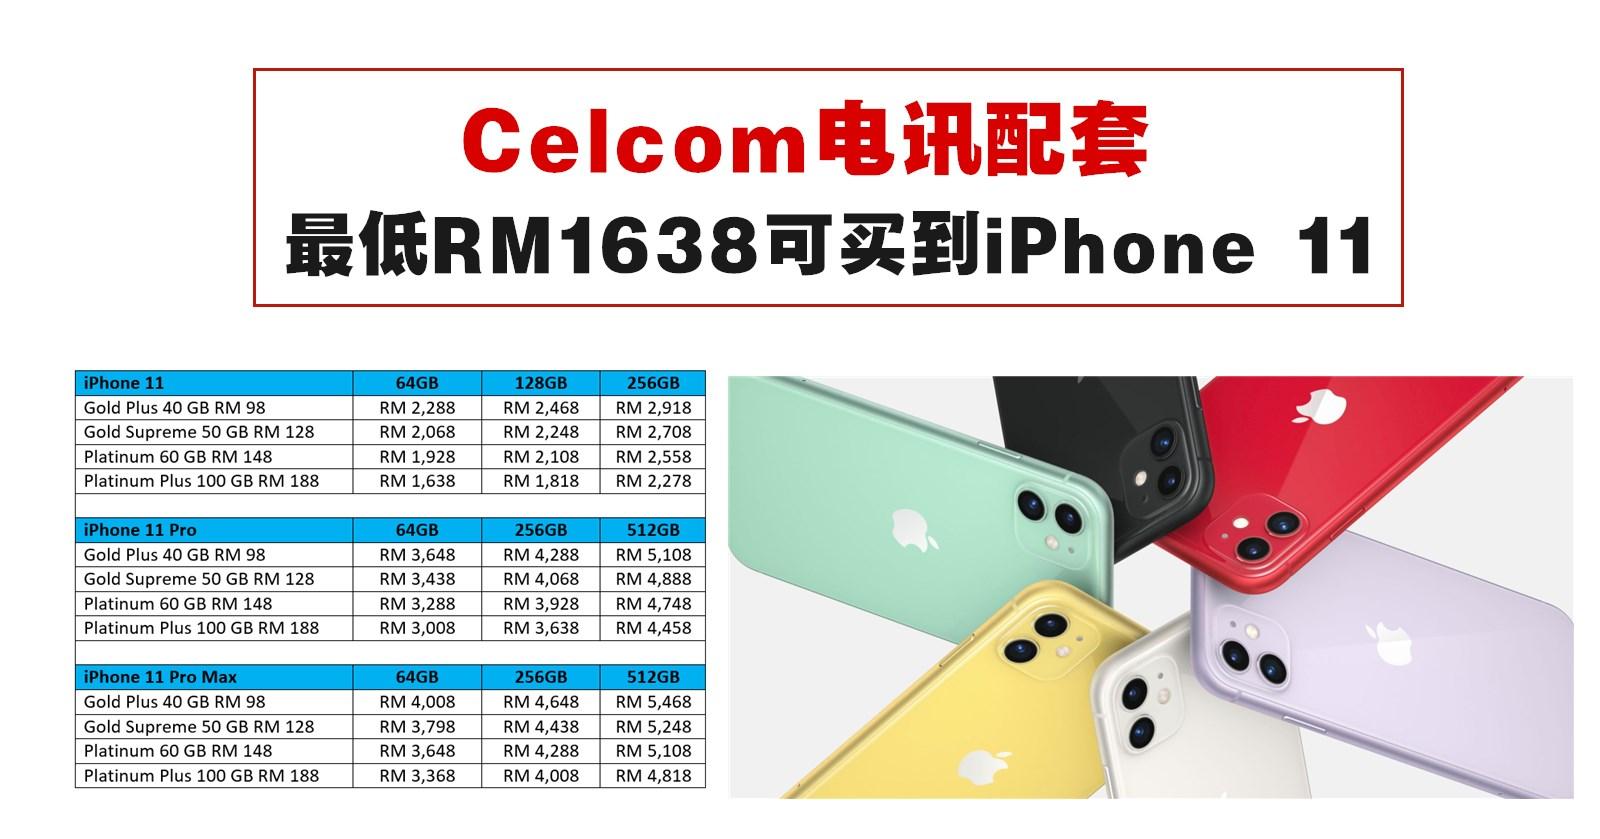 Celcom电讯配套,最低RM1638可买到iPhone 11